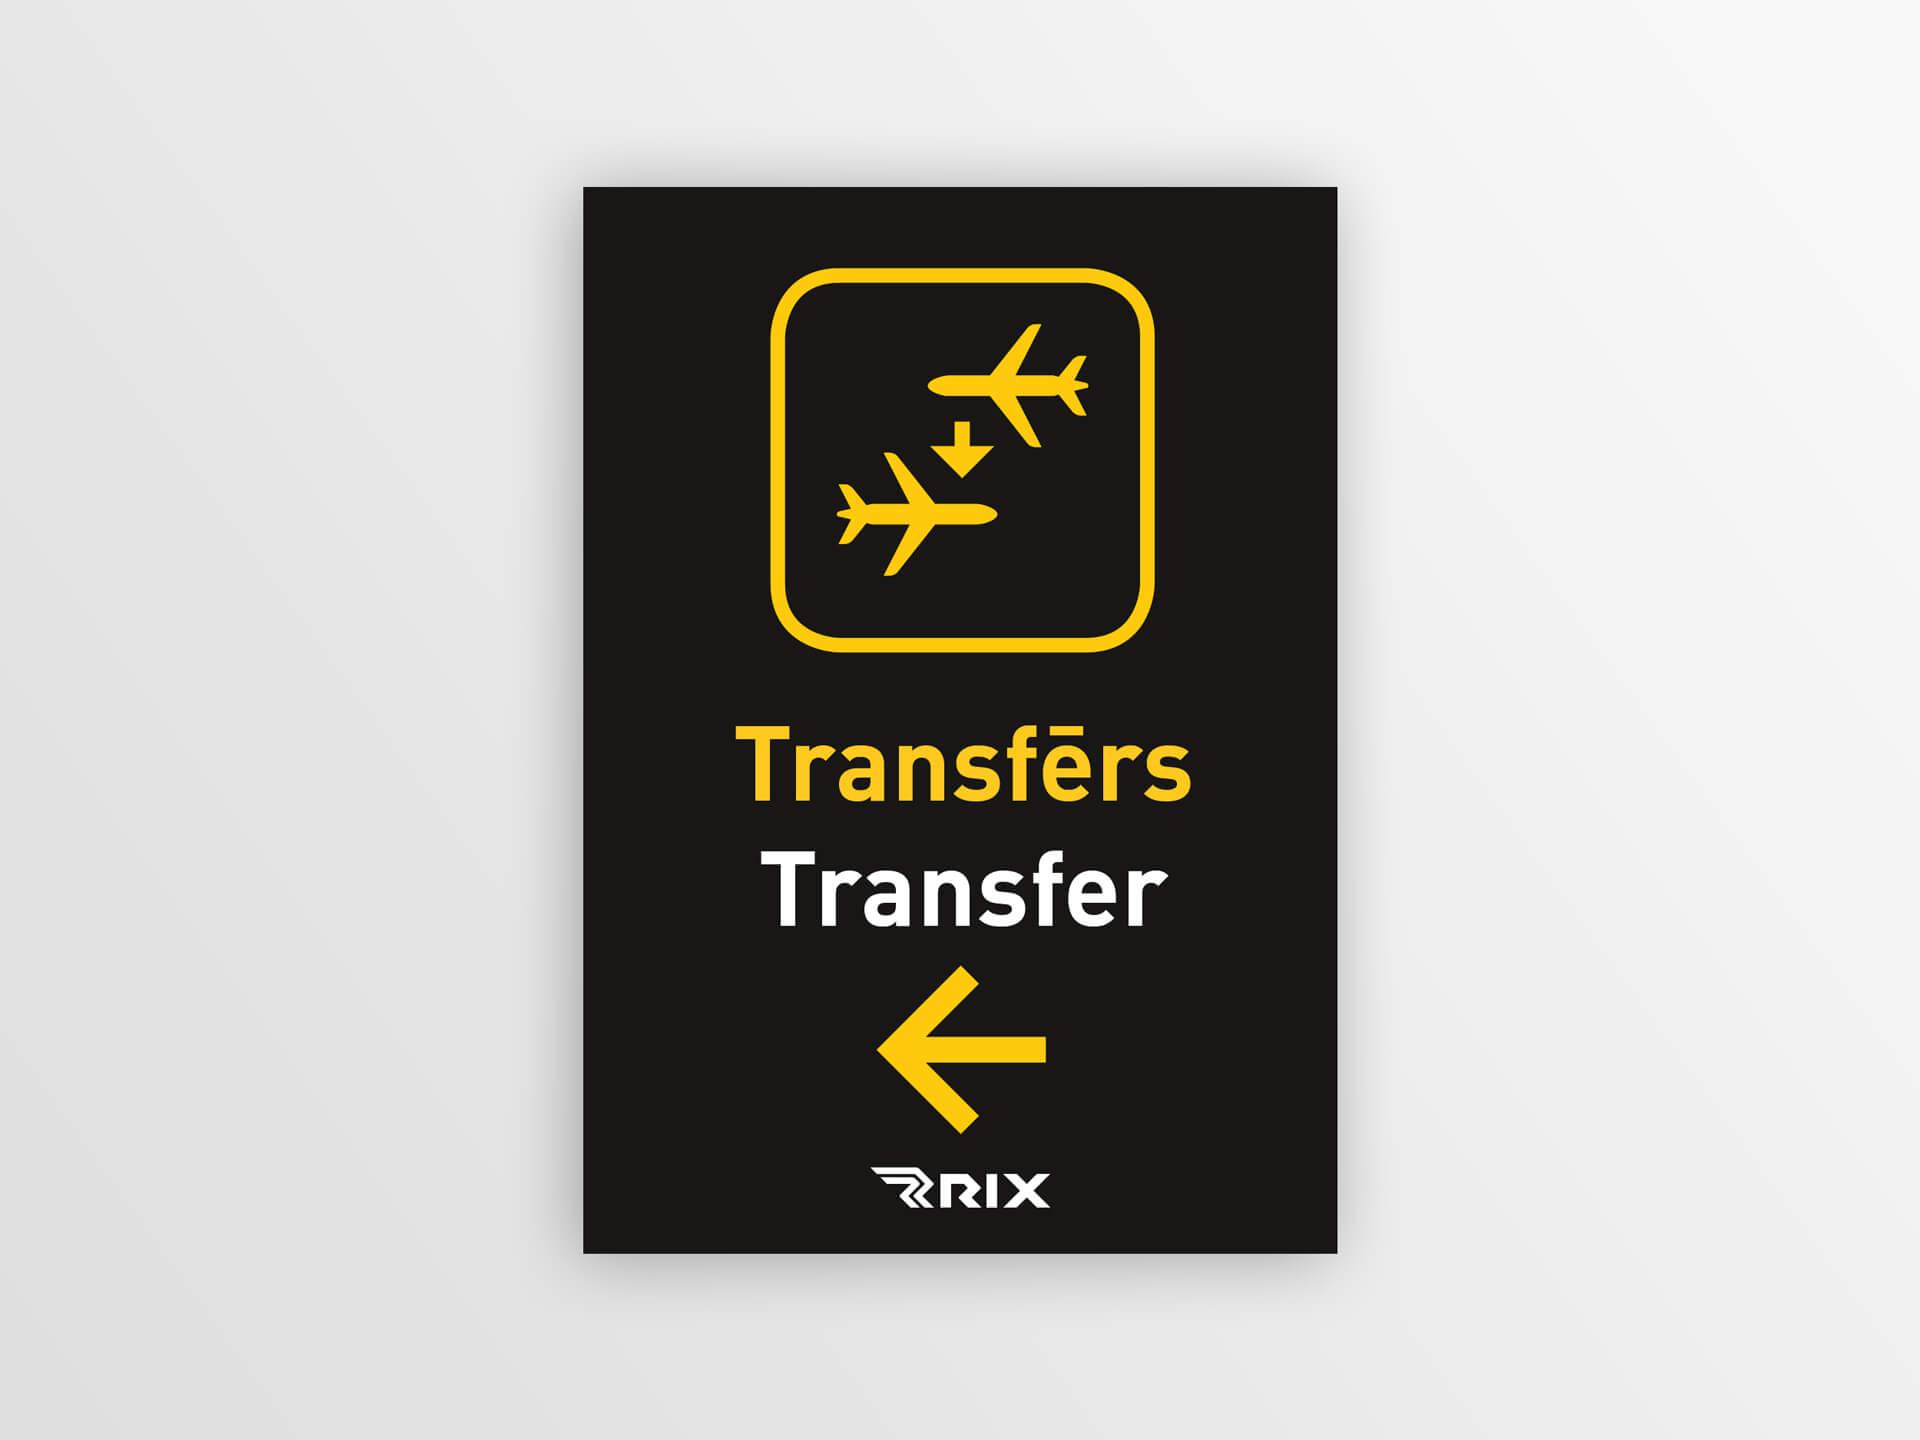 A3-Transfers-plakats-5